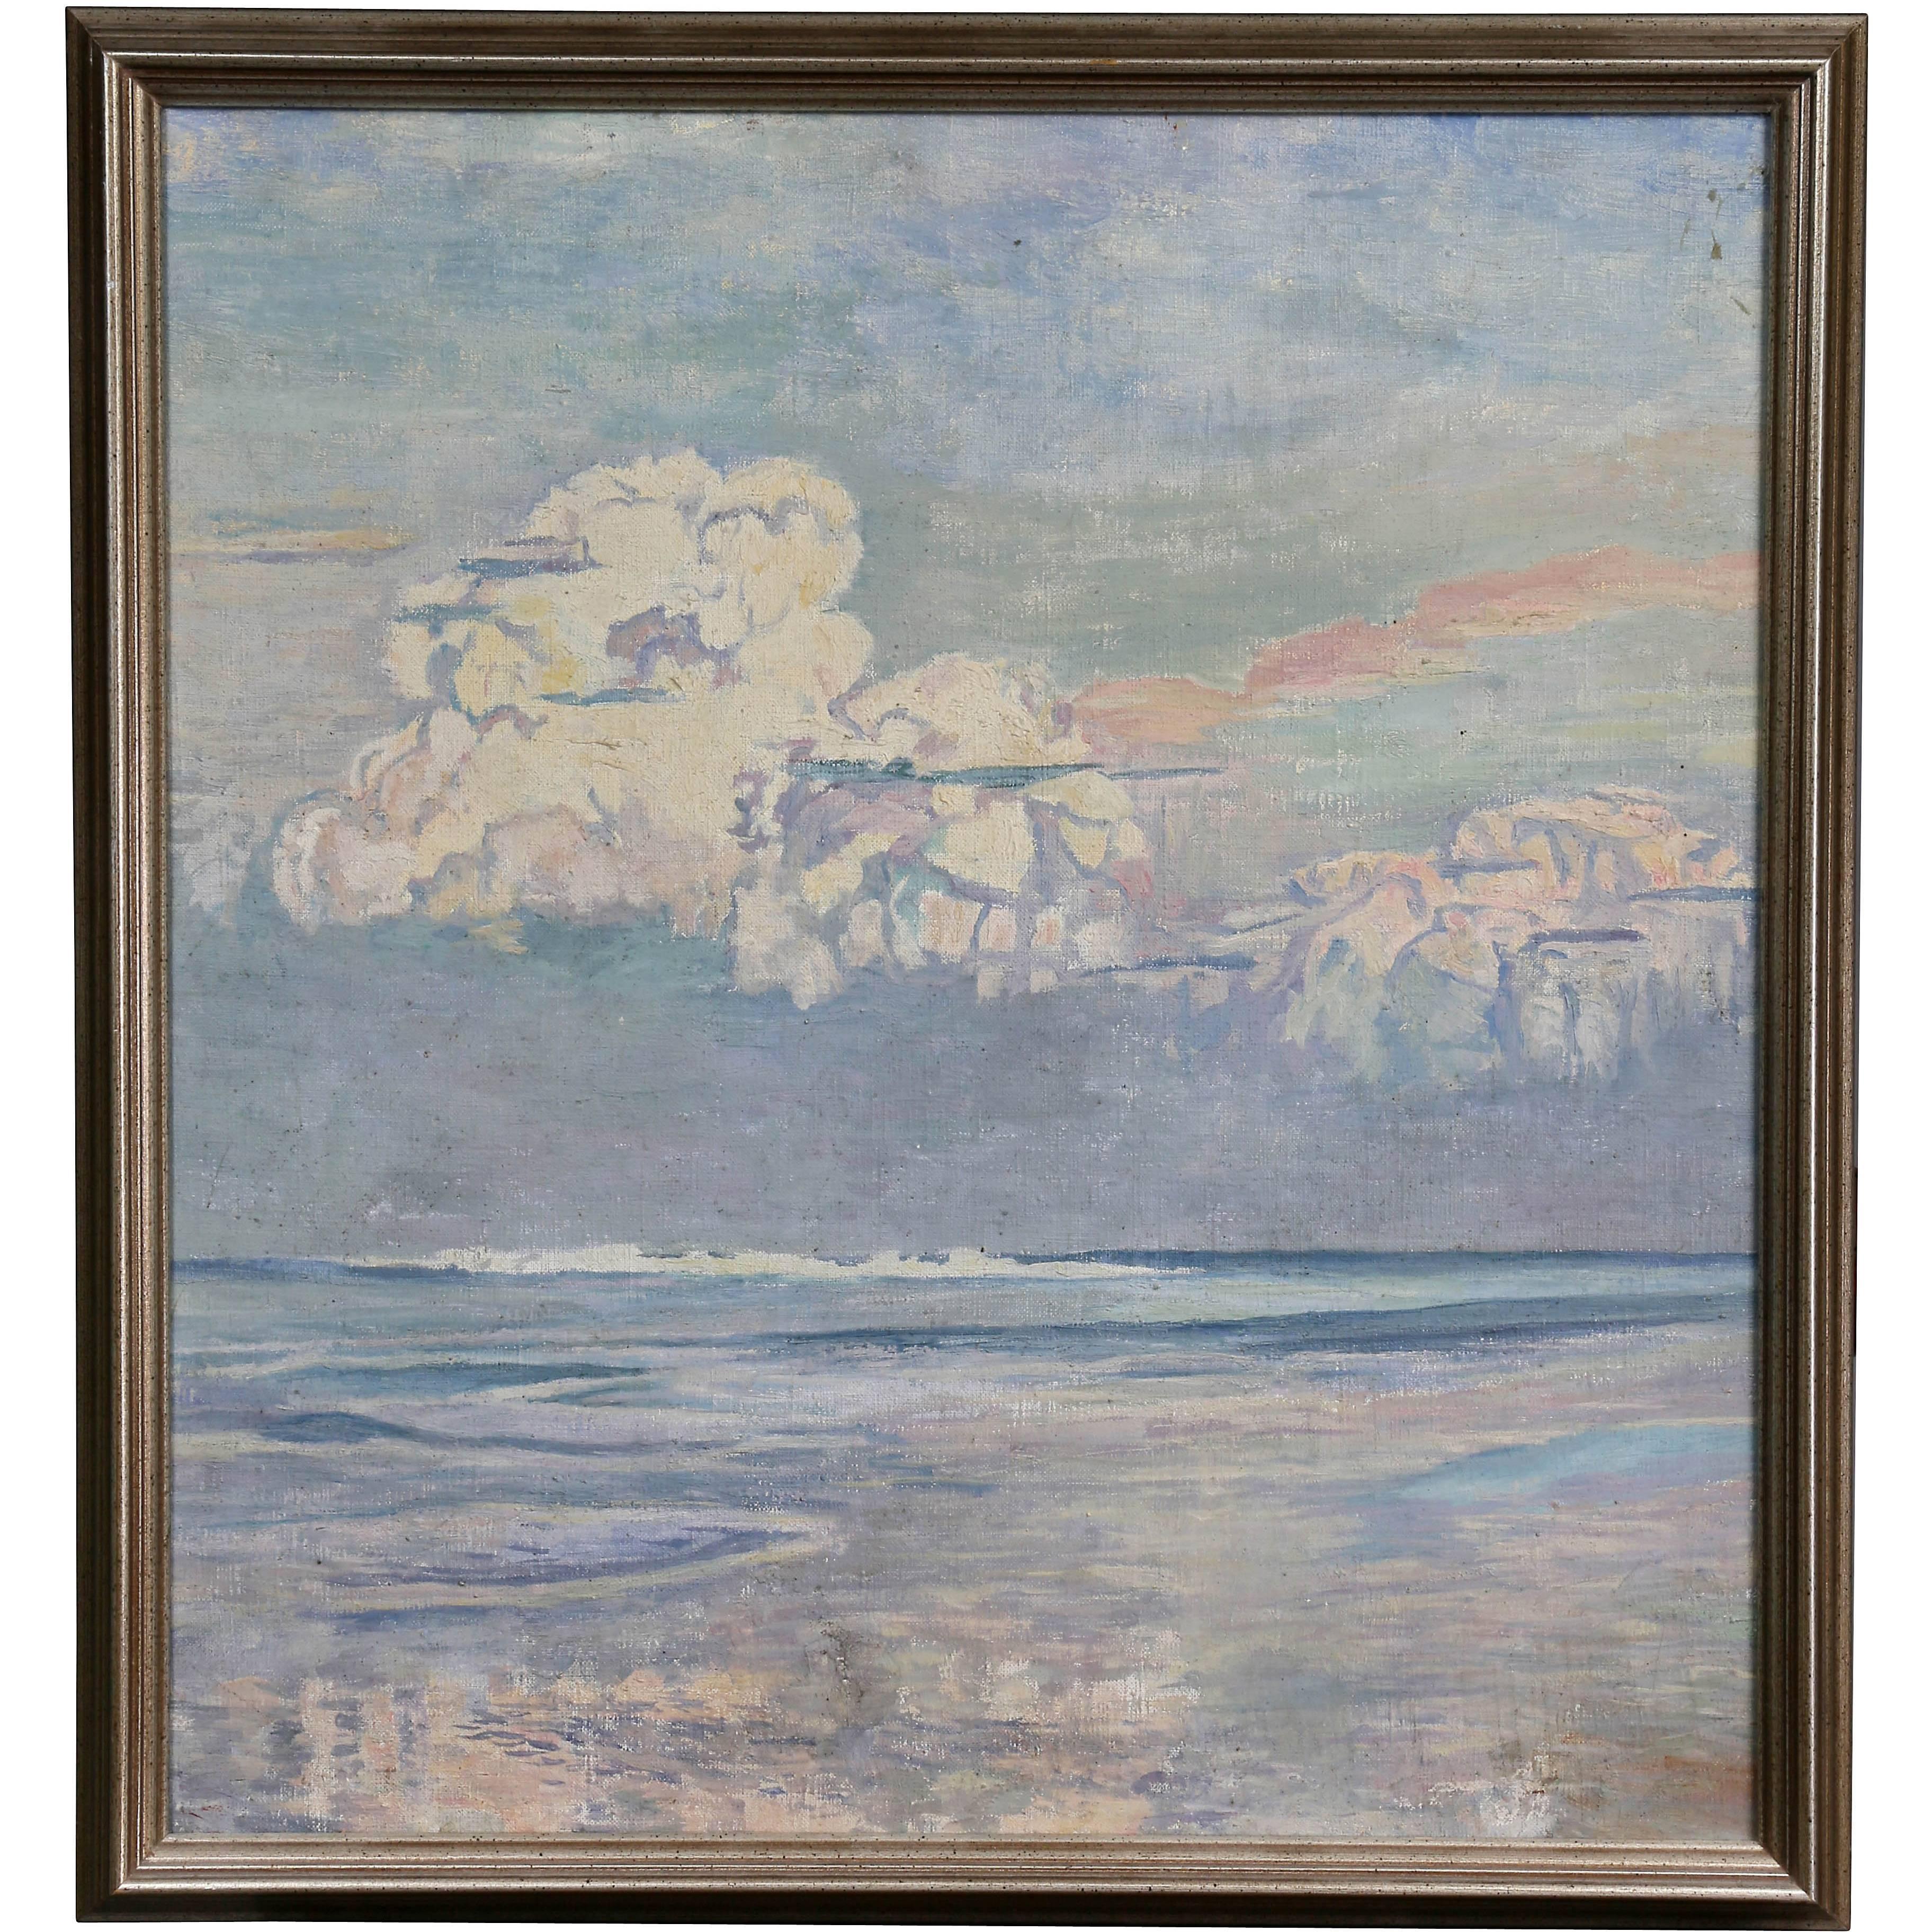 California Seascape Oil on Canvas by Martha Eleanor Nicholson Hurst